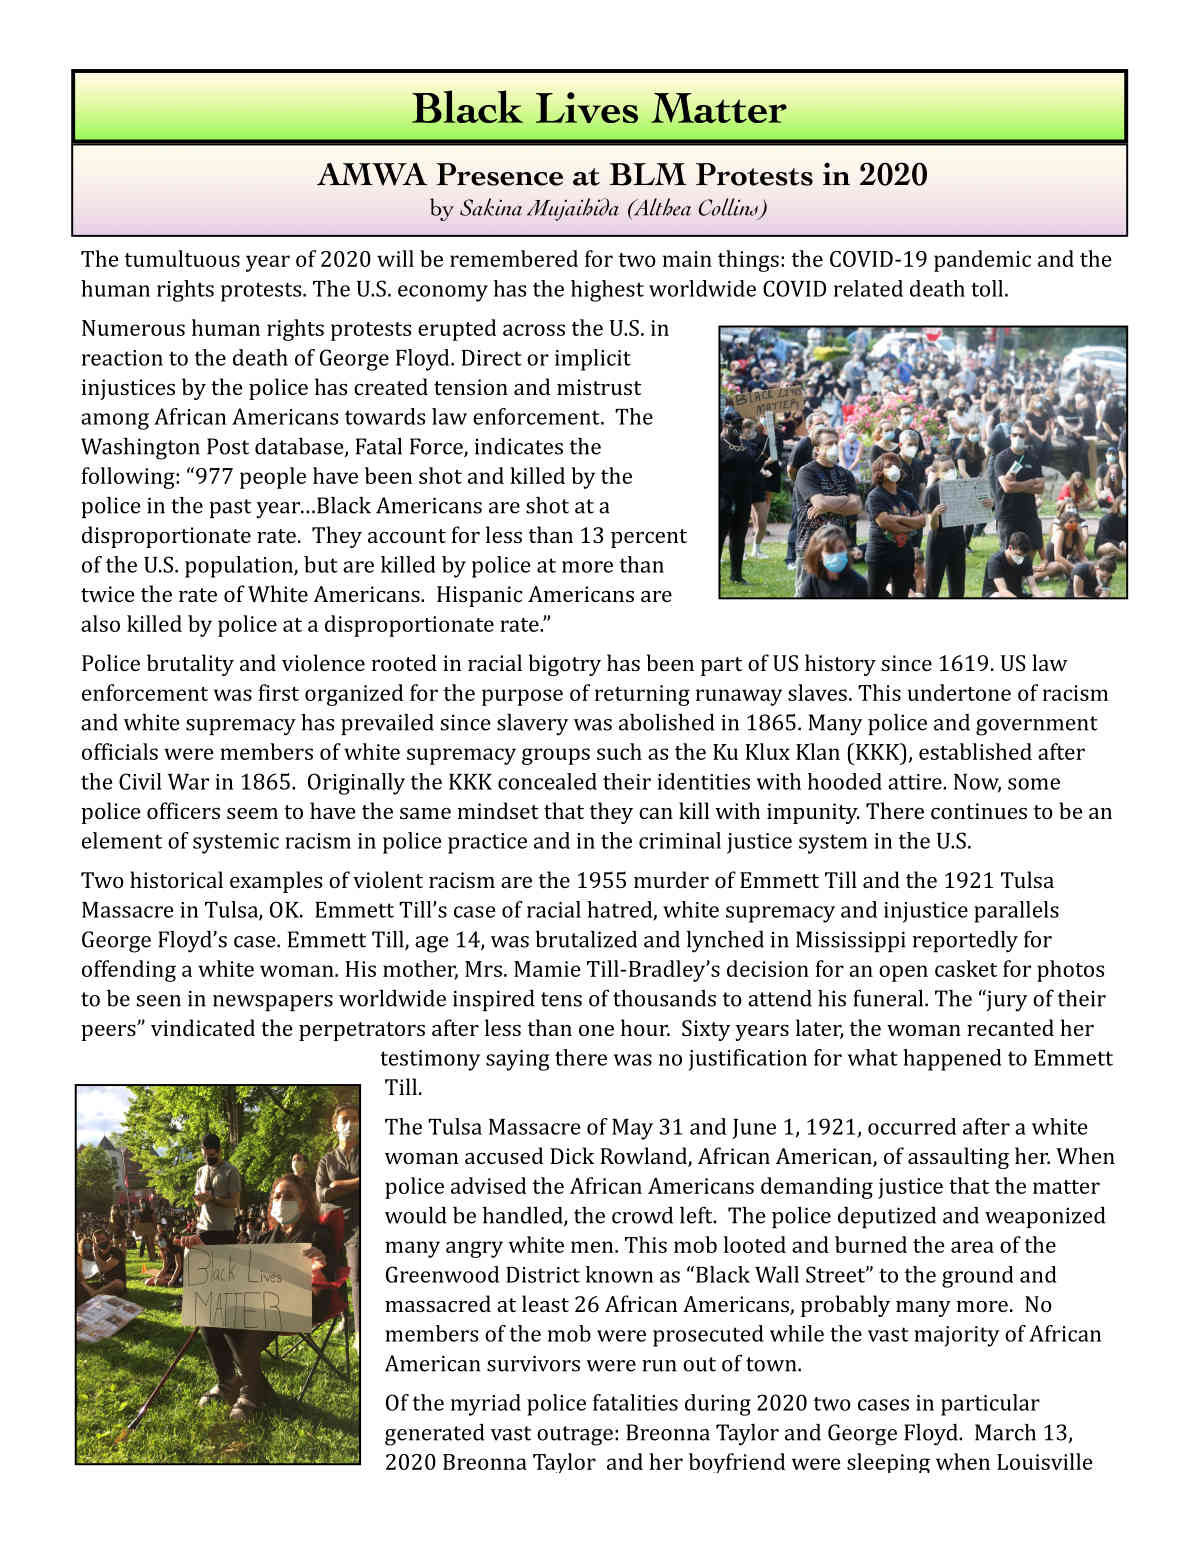 AMWA's Newsletter 2021